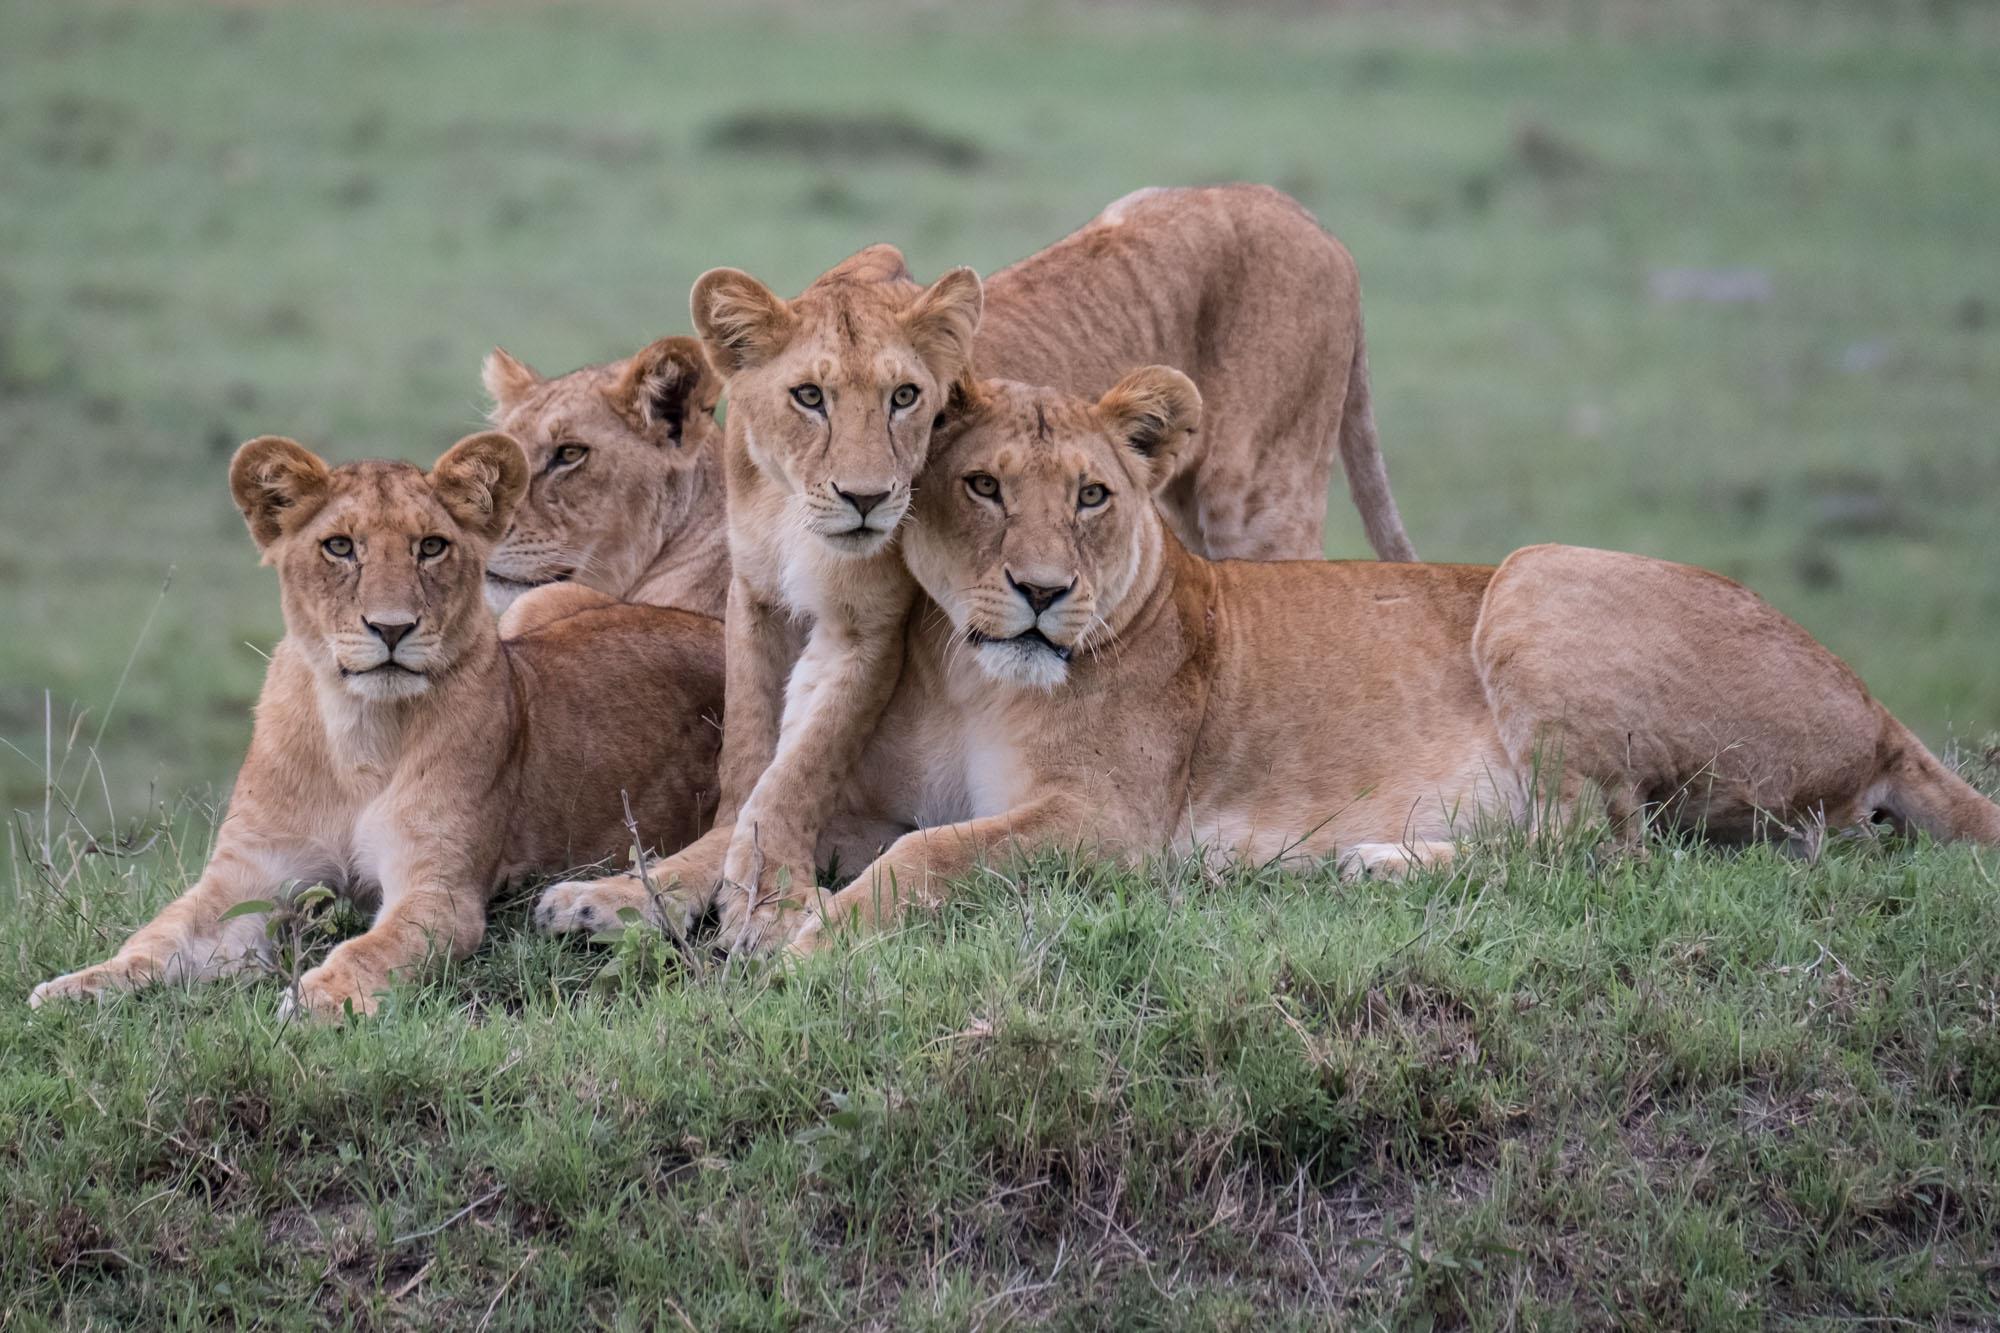 lions-family-portrait-mara-kenya-2018-01-12.jpg